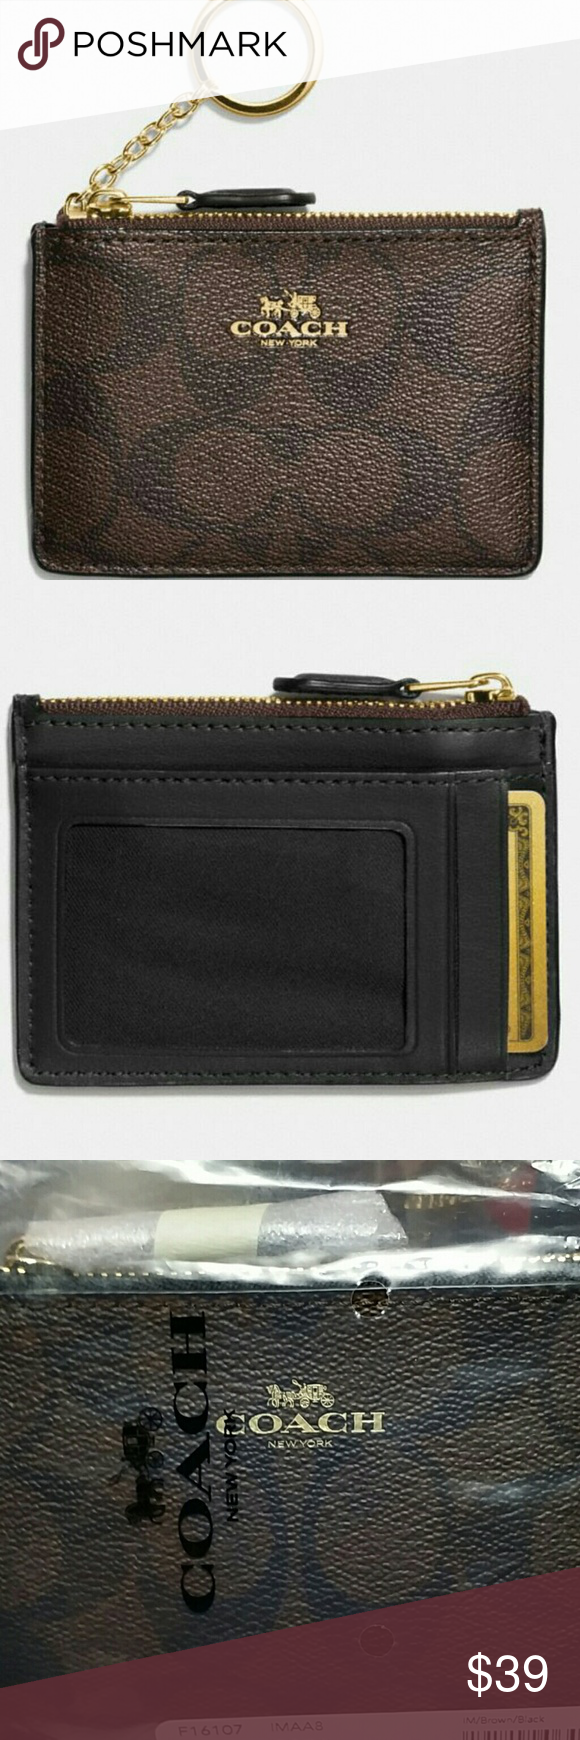 ❤ COACH ID  CREDIT CARD KEY CHAIN WALLET❤ AUTHENTIC COACH ... 431f8b157743c